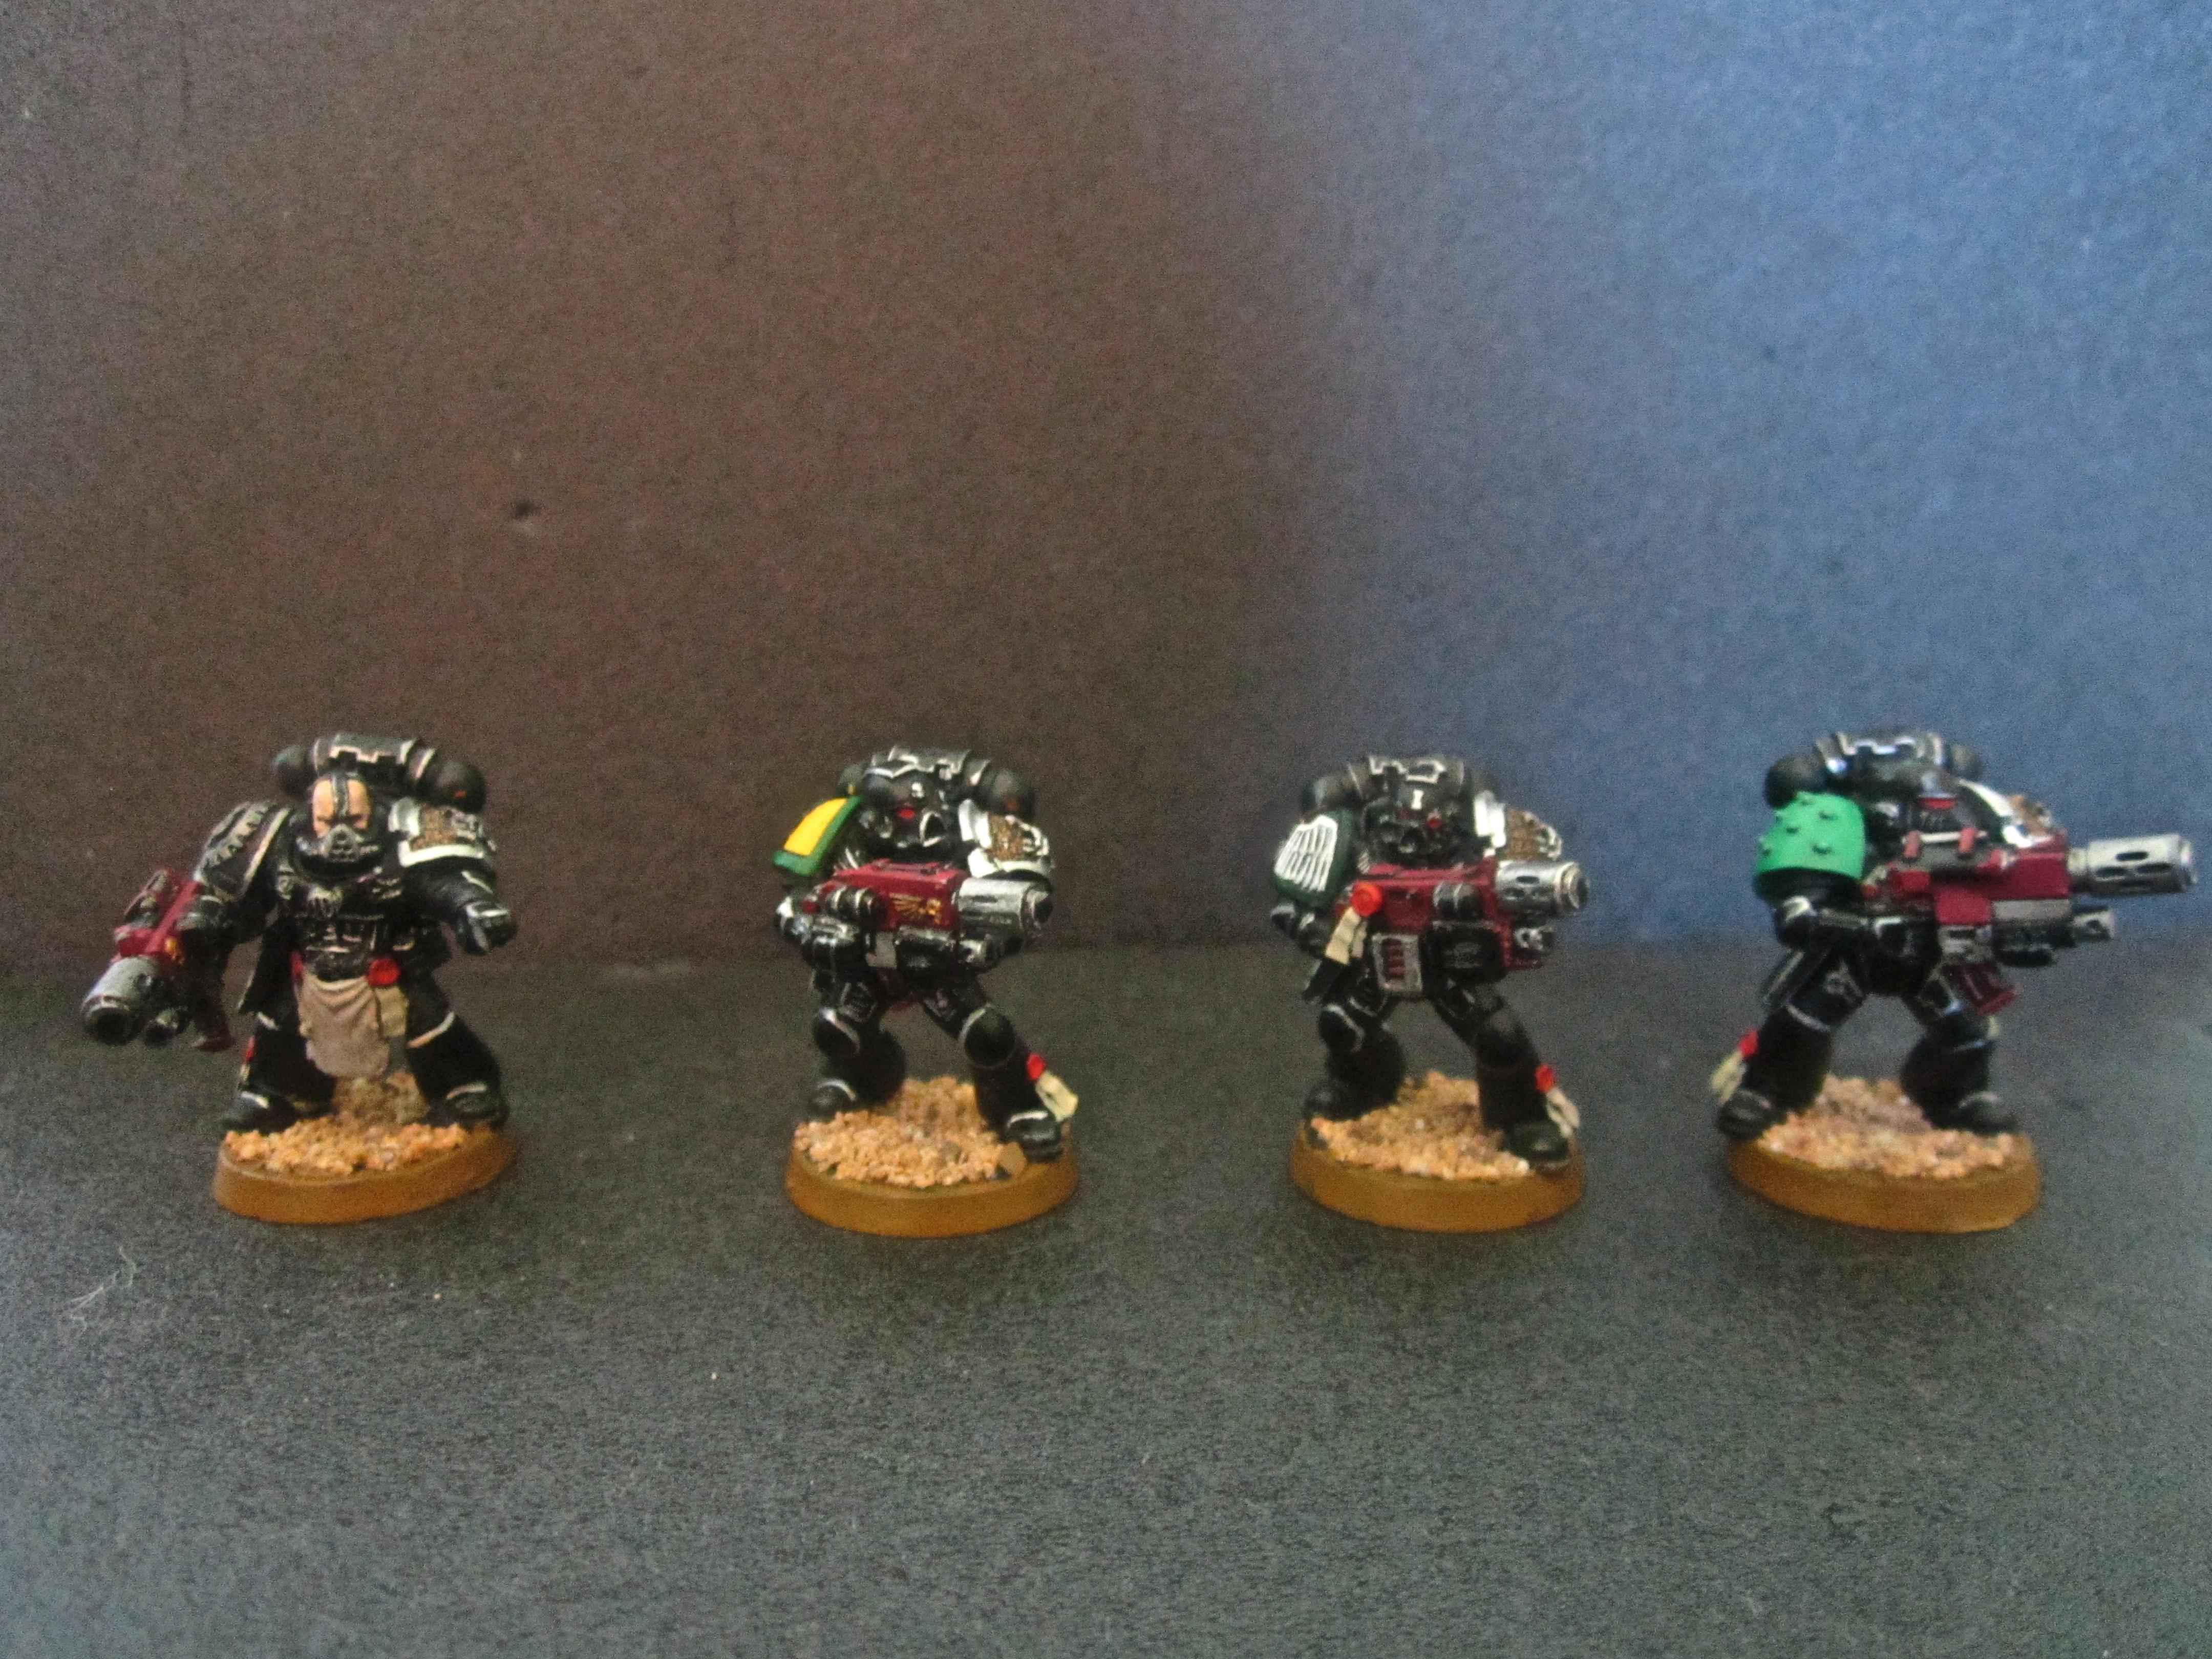 Combi-melta, Death Watch, Deathwatch, Inquisition, Space Marines, Stern Guard